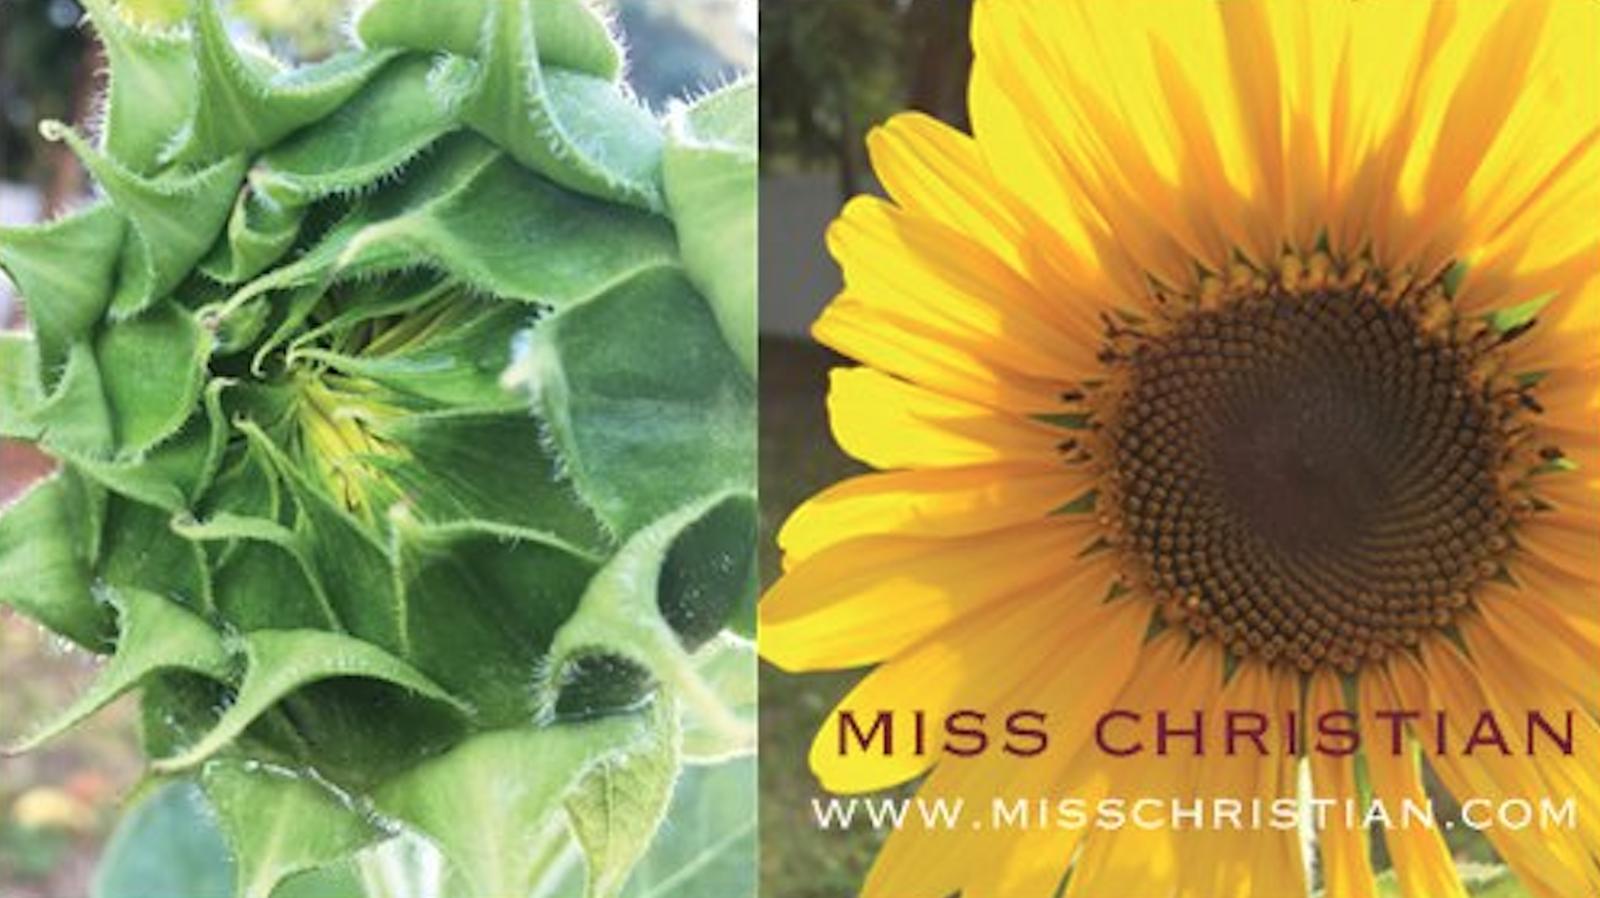 Miss Christian